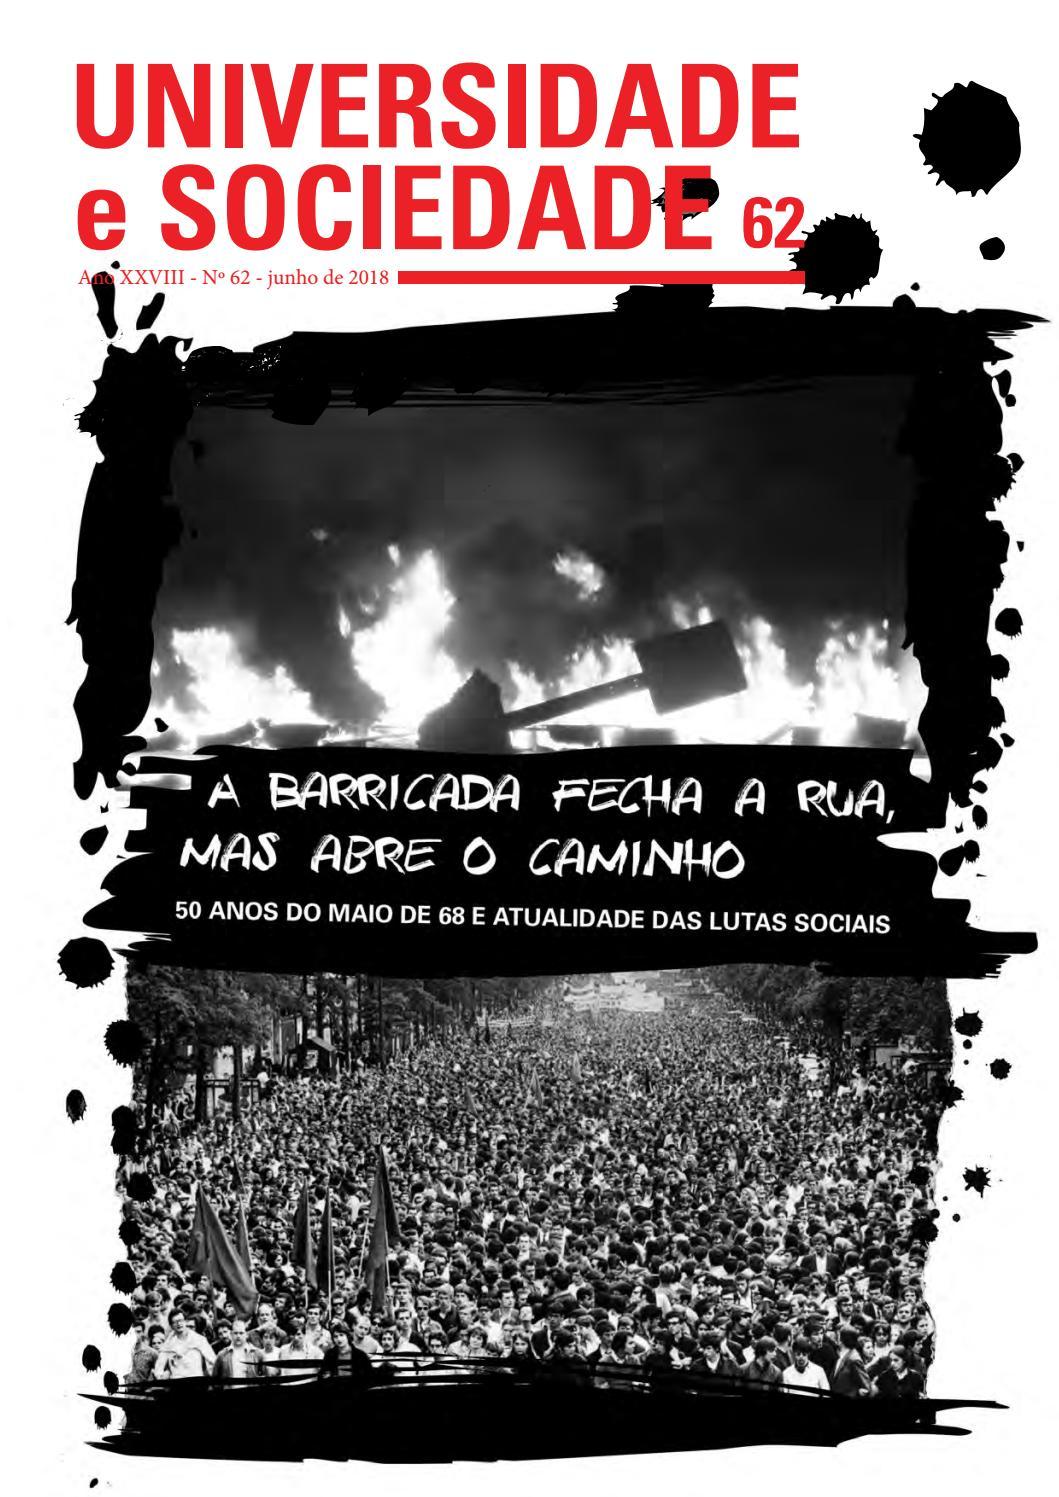 Revista Universidade e Sociedade 62 by ANDES-SN - issuu 65d86e7508318